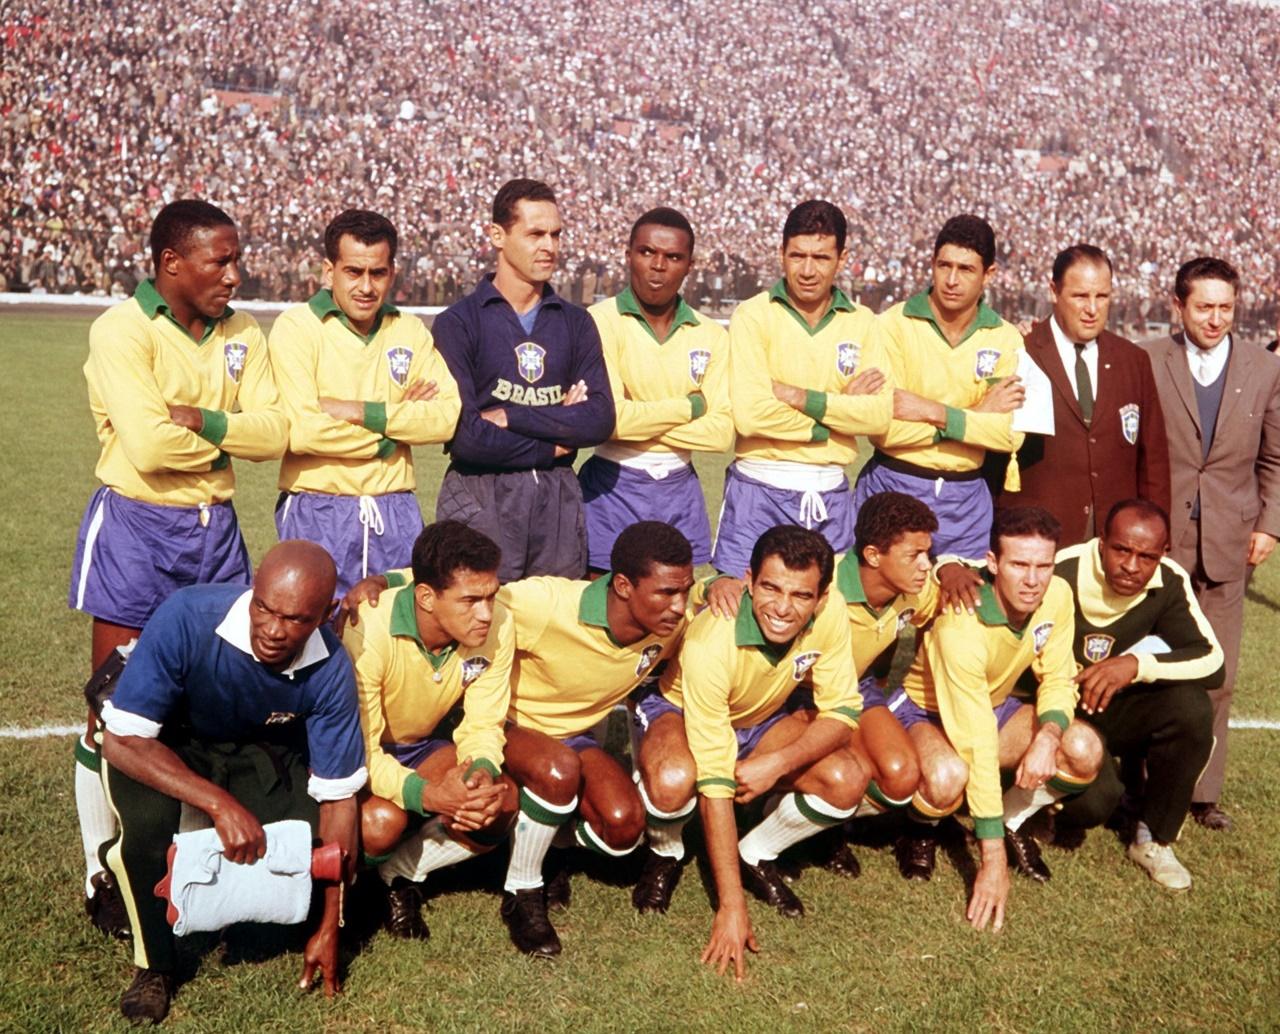 wchd-1962-brazil-teams